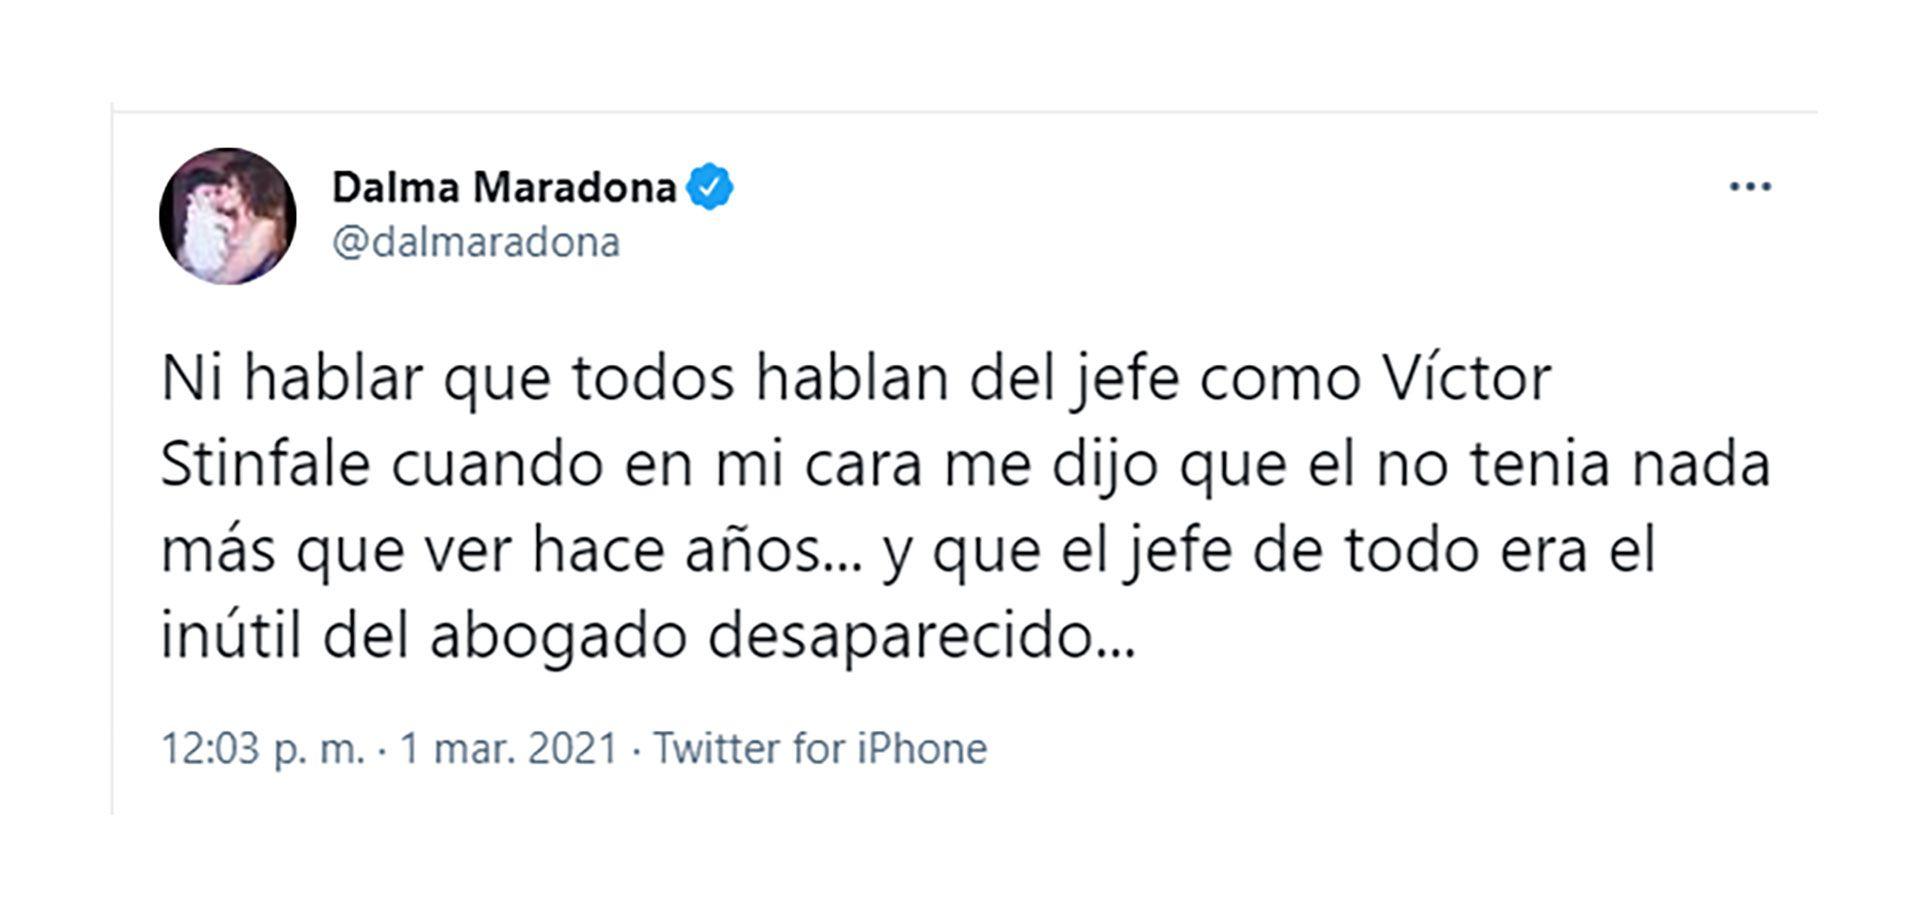 Tw Dalma Maradona